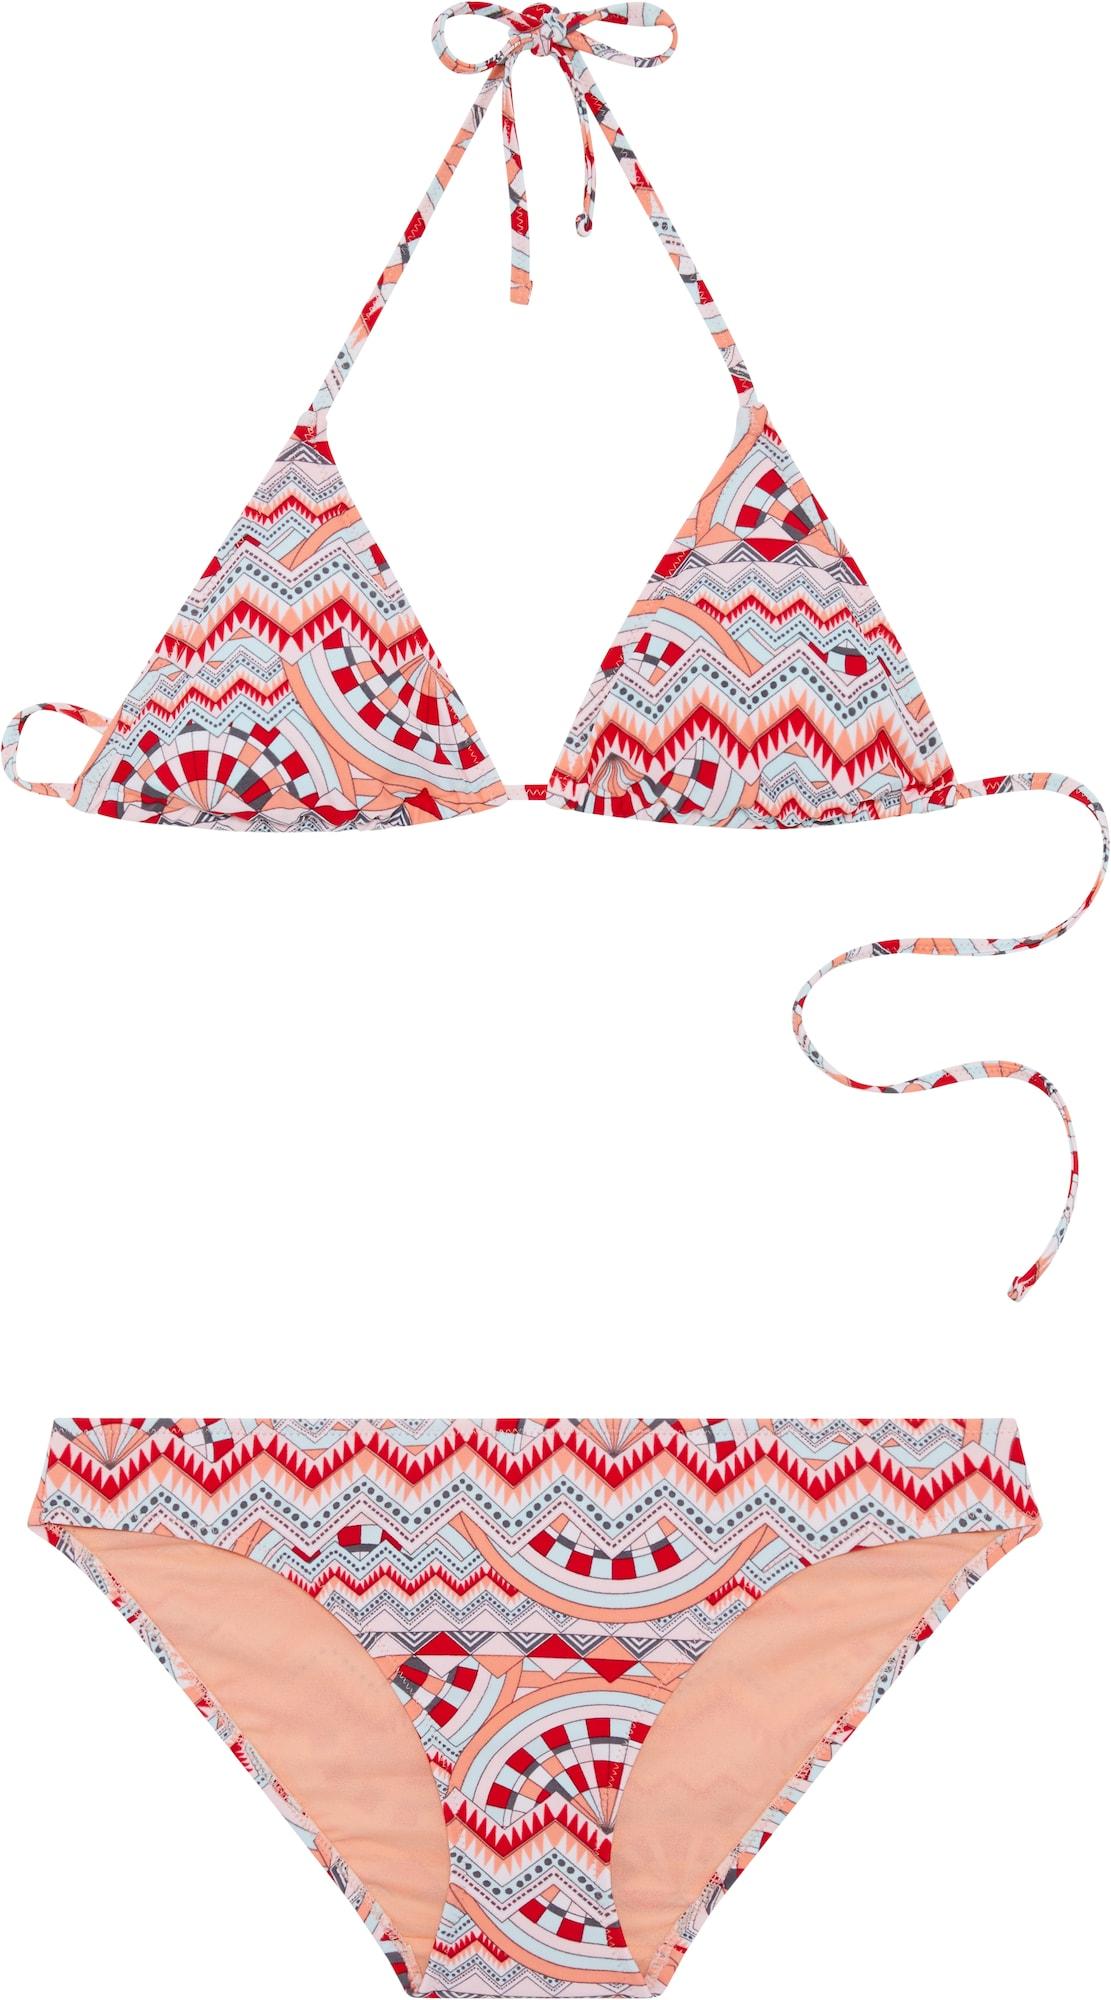 CHIEMSEE, Dames Bikini 'LANA', lichtblauw / koraal / rood